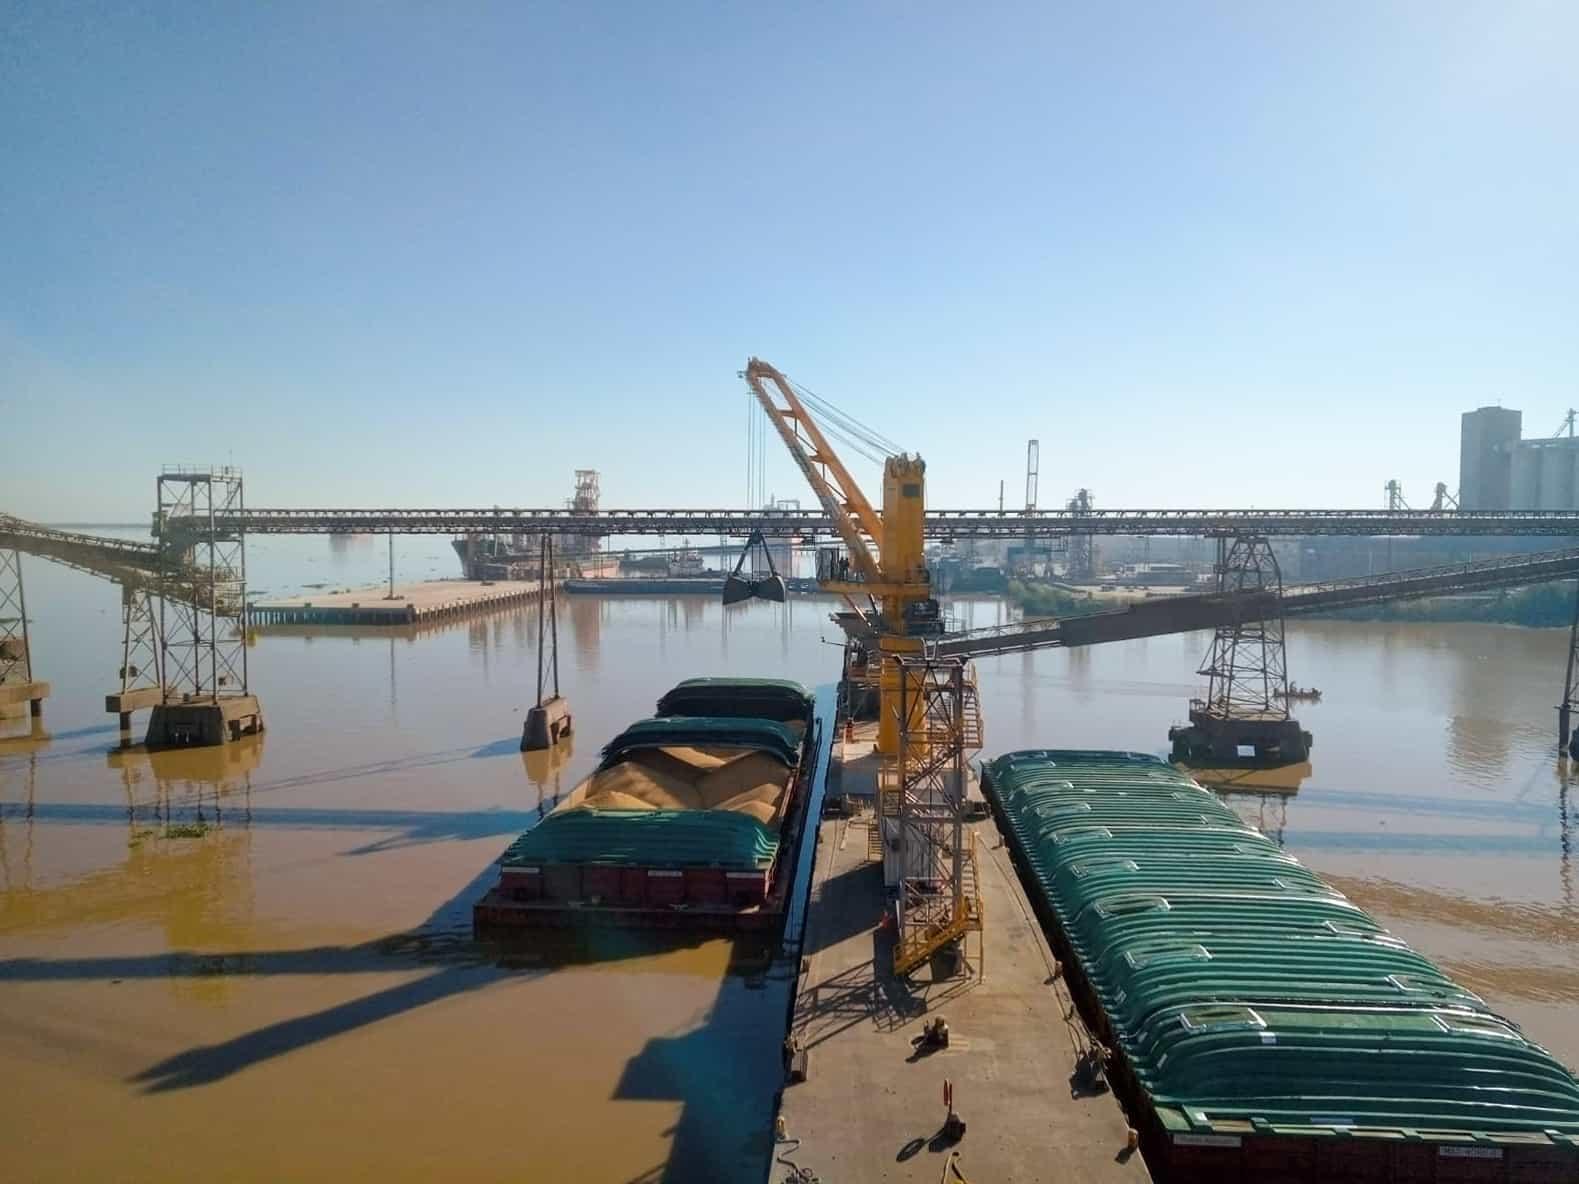 Corporación Navios replaces harbour crane with new Liebherr model